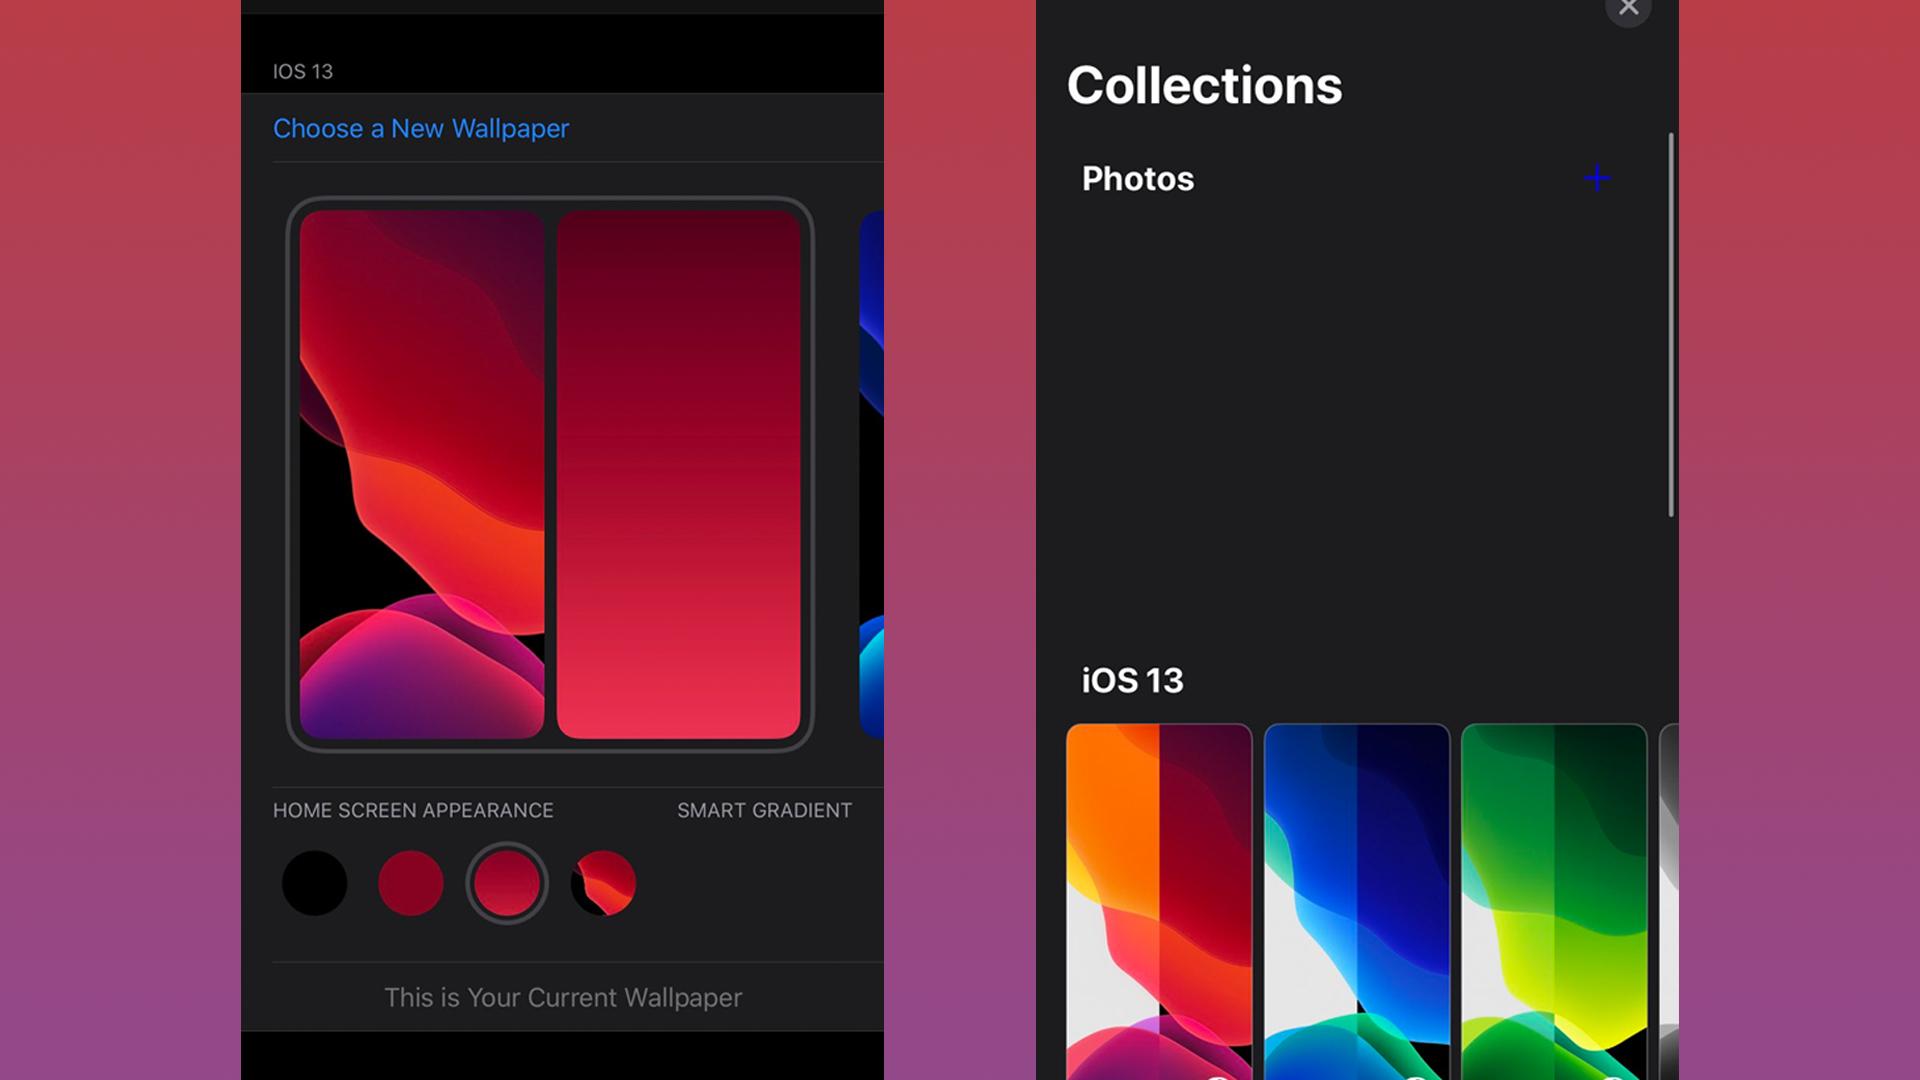 Leaked iOS 14 screenshot shows new wallpaper settings beta code 1920x1080